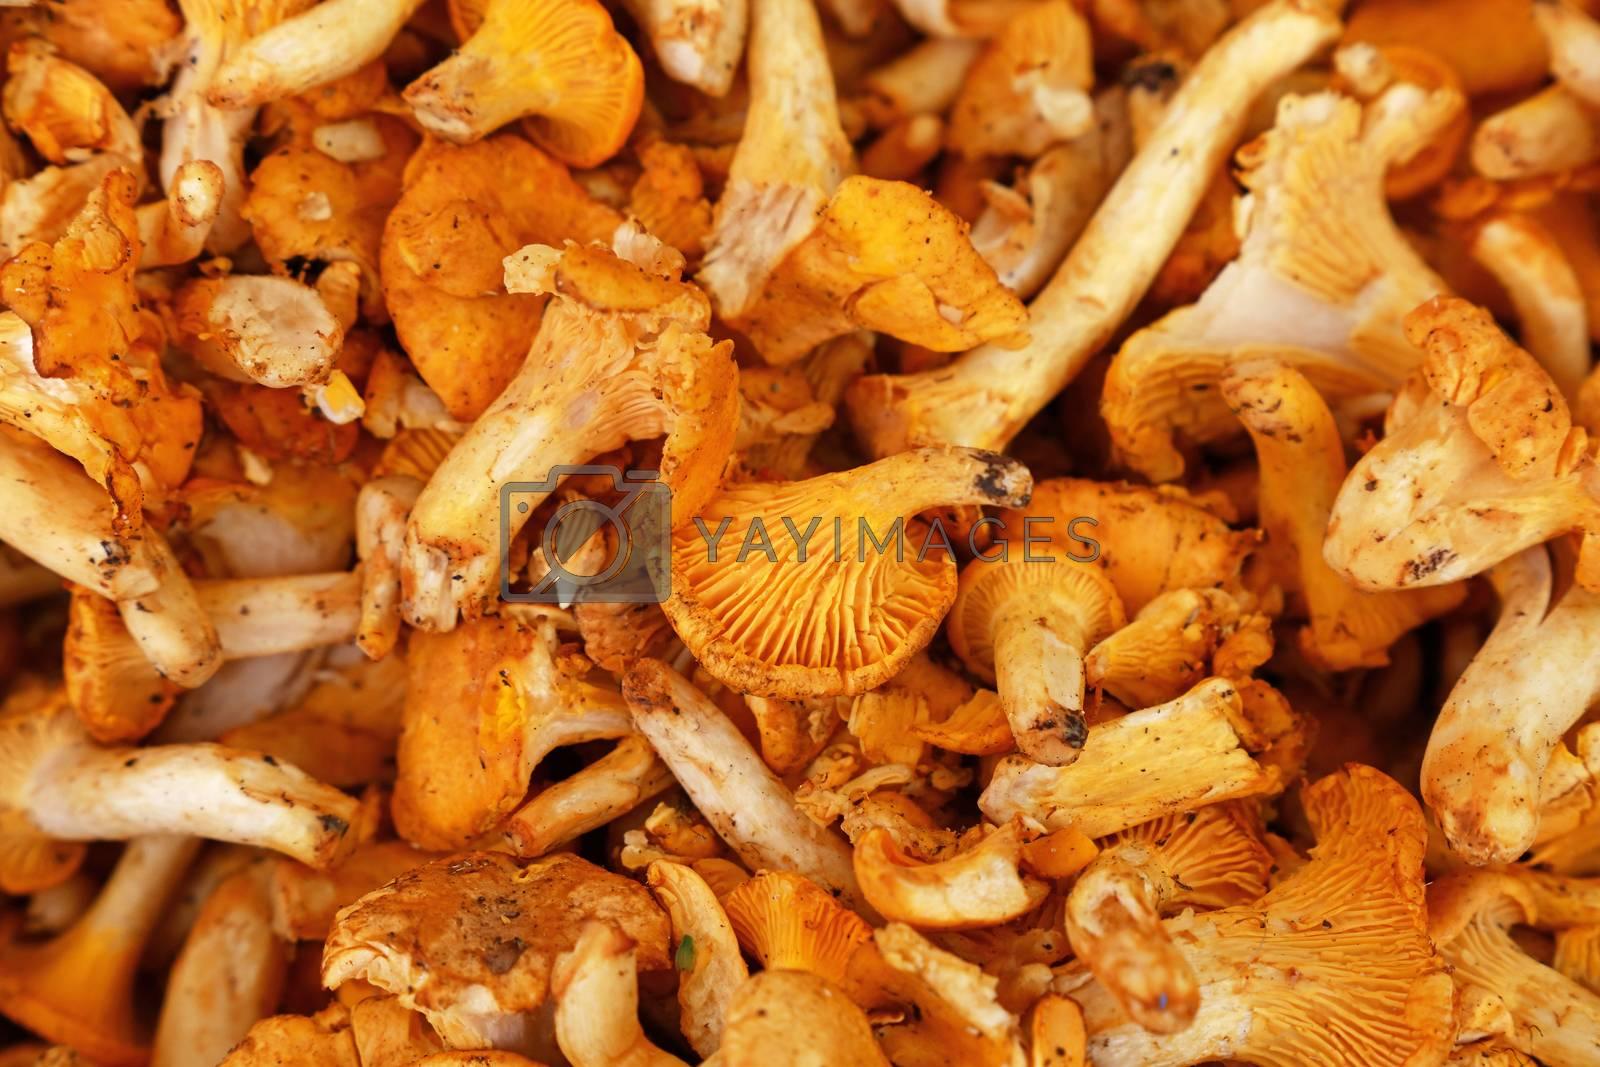 Close up yellow chanterelle edible mushrooms (Cantharellus cibarius) at retail display, high angle view